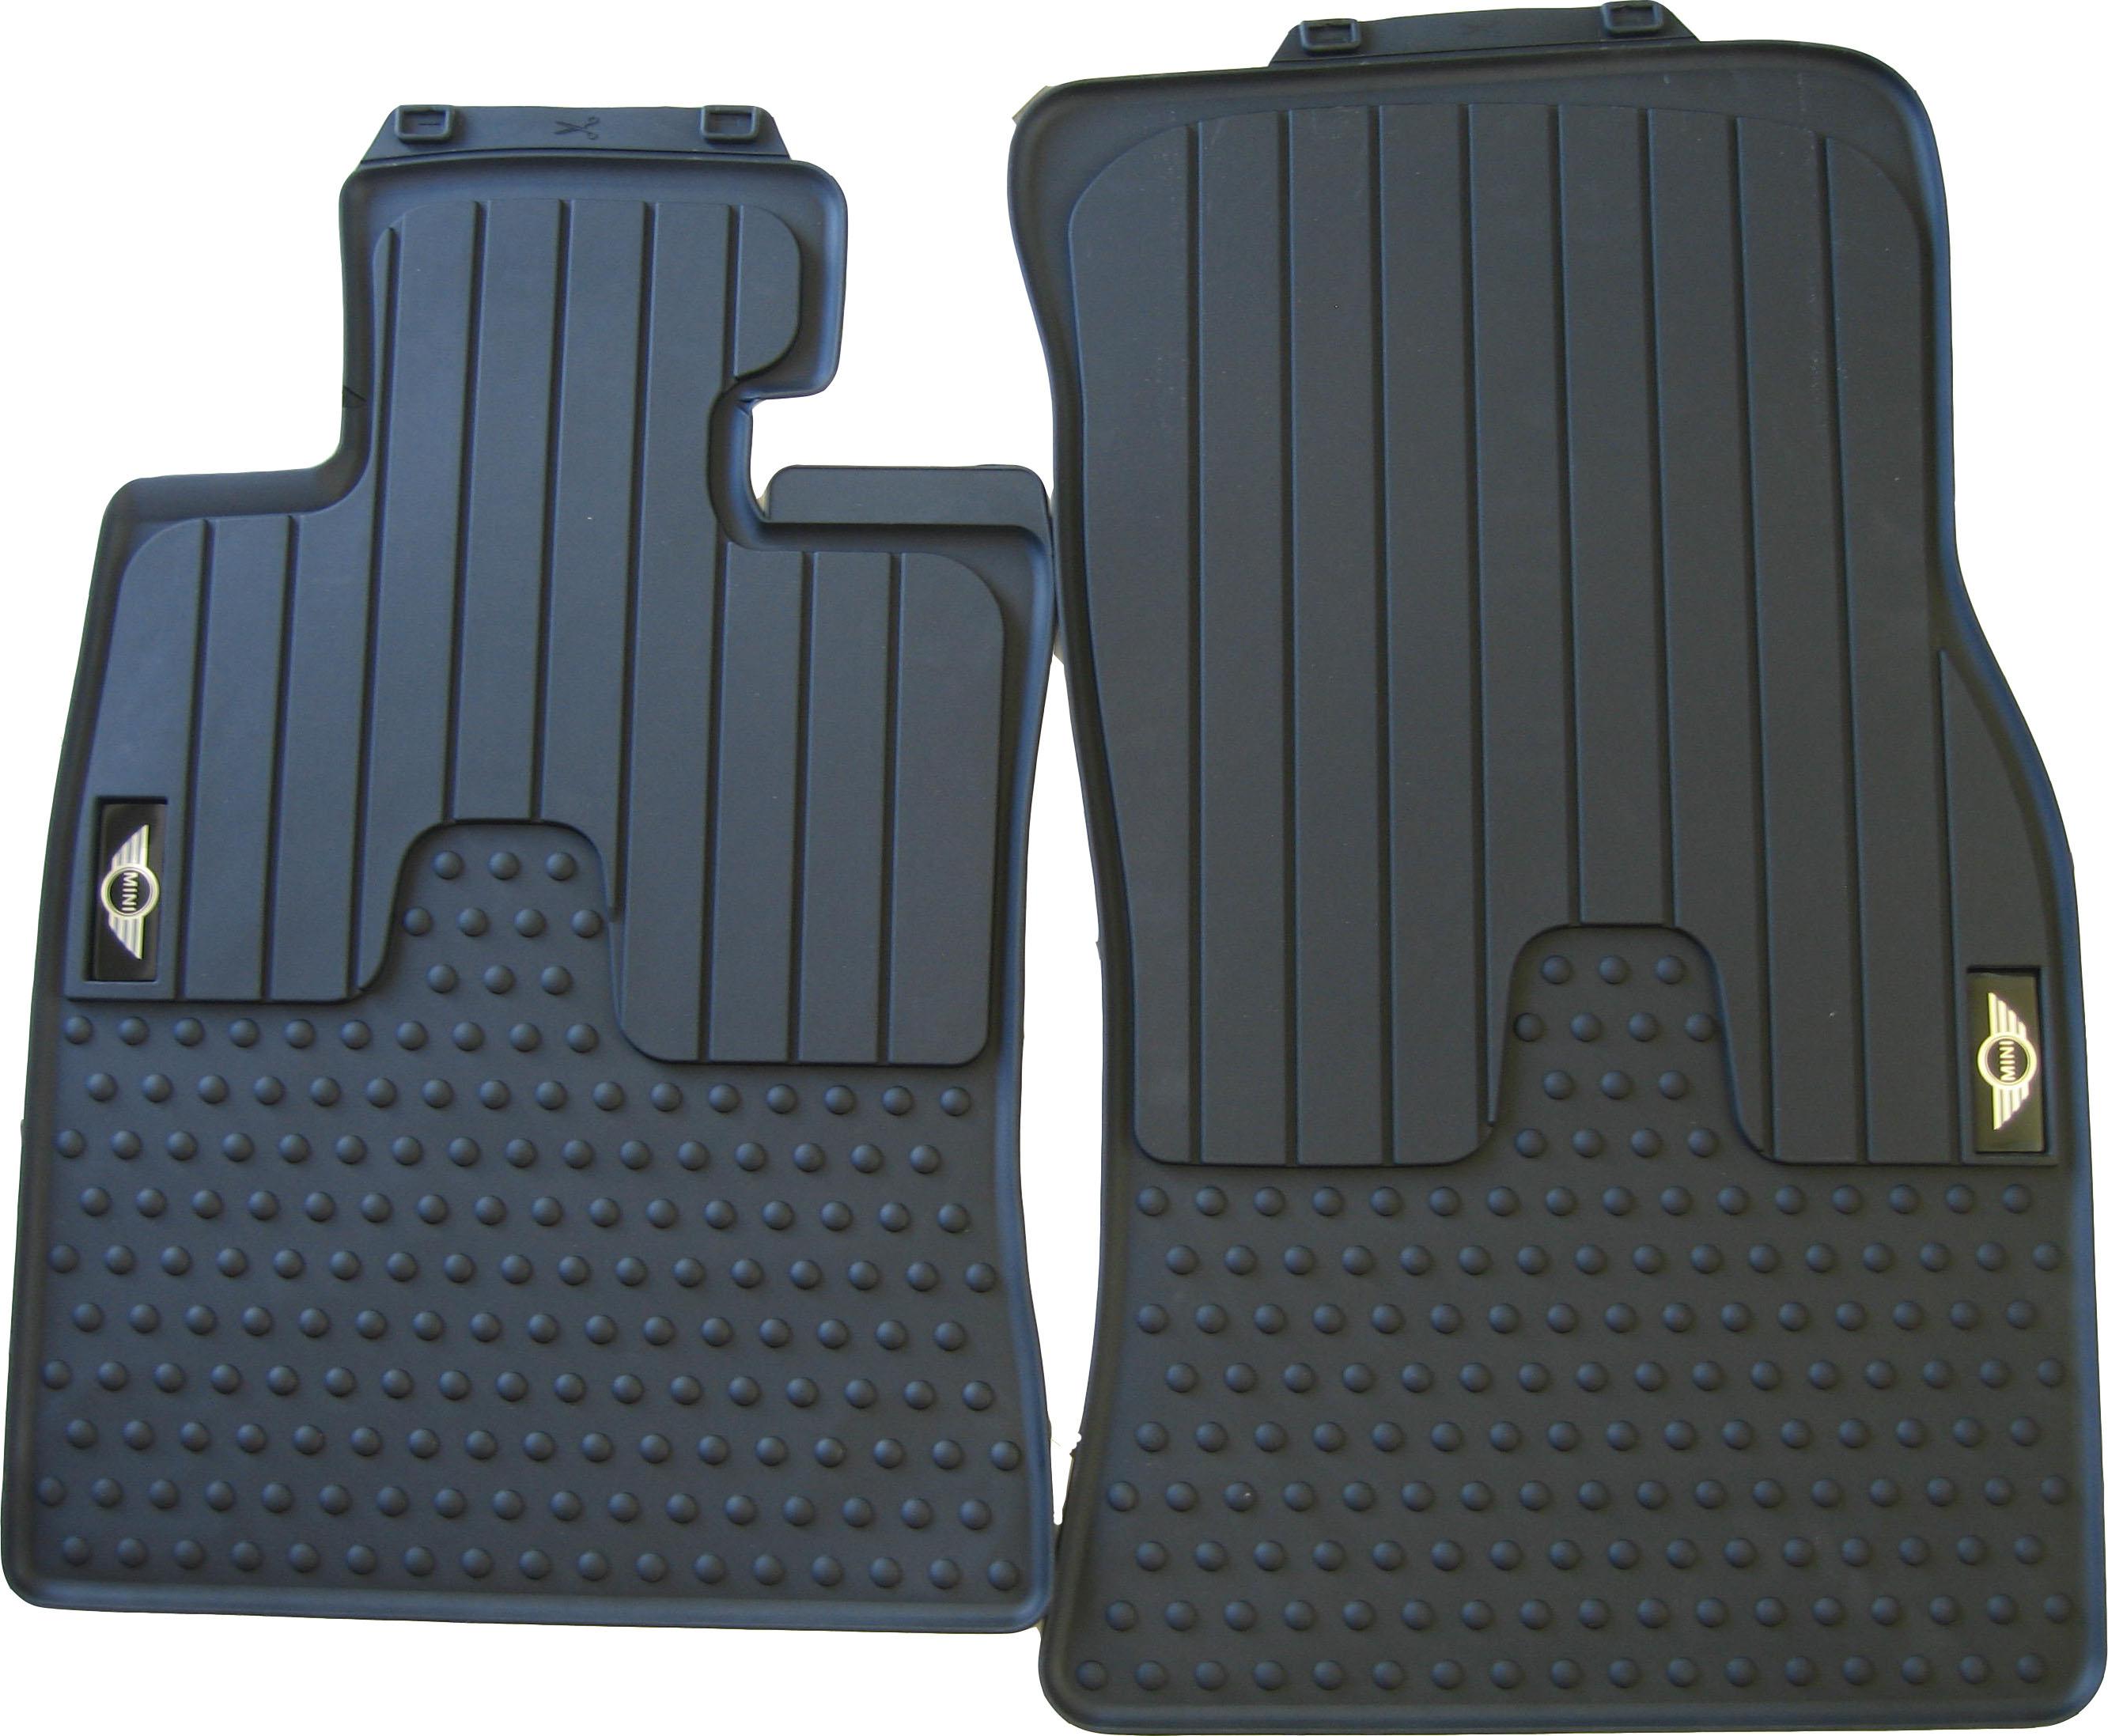 Gummifussmatten Mini Cooper Bj 01-14 Automatten Fußmatten Passform schwarz